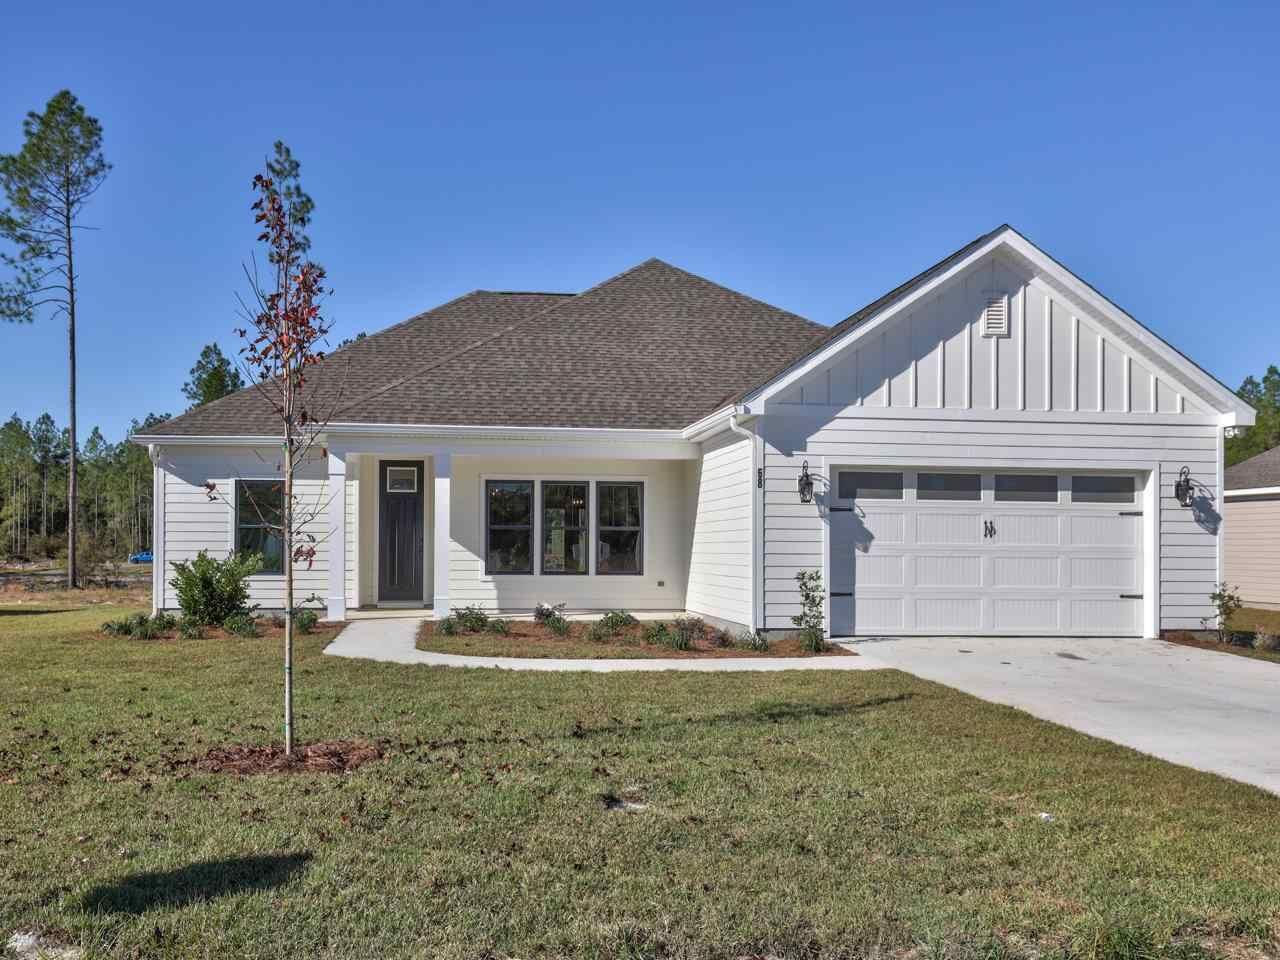 39 Stillmont Drive, Crawfordville, FL 32327 - MLS#: 331716